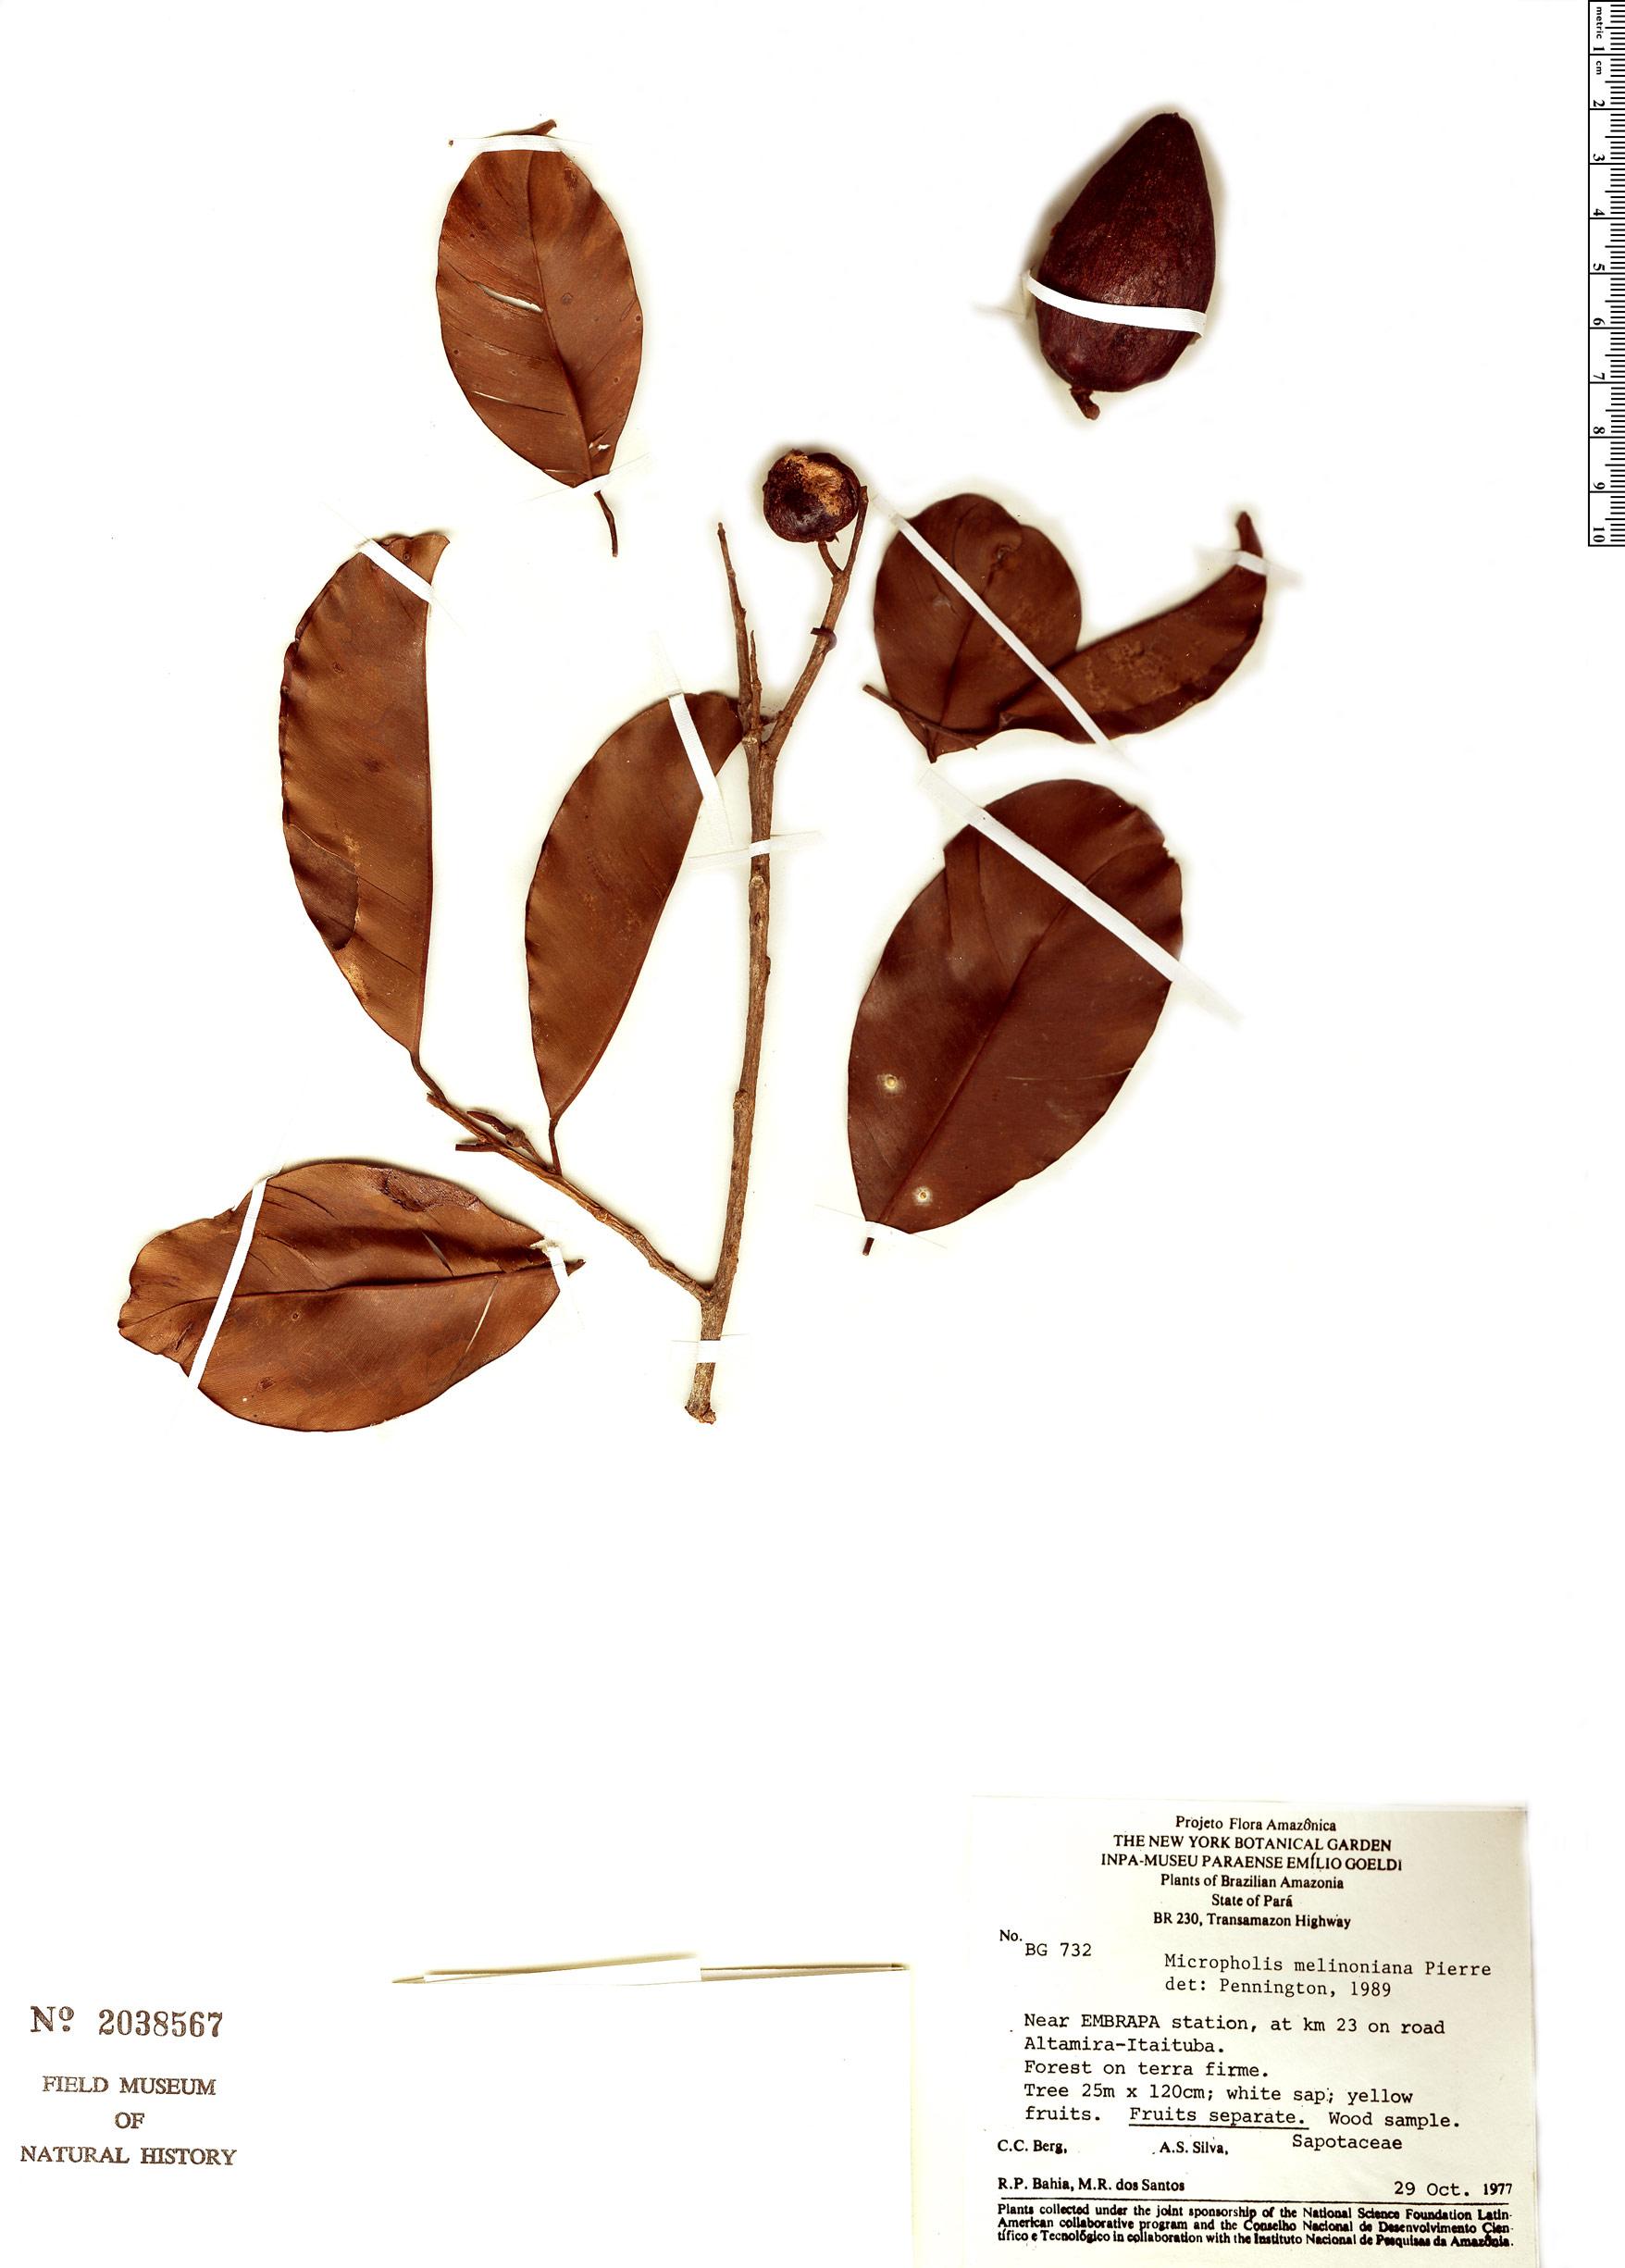 Specimen: Micropholis melinoniana